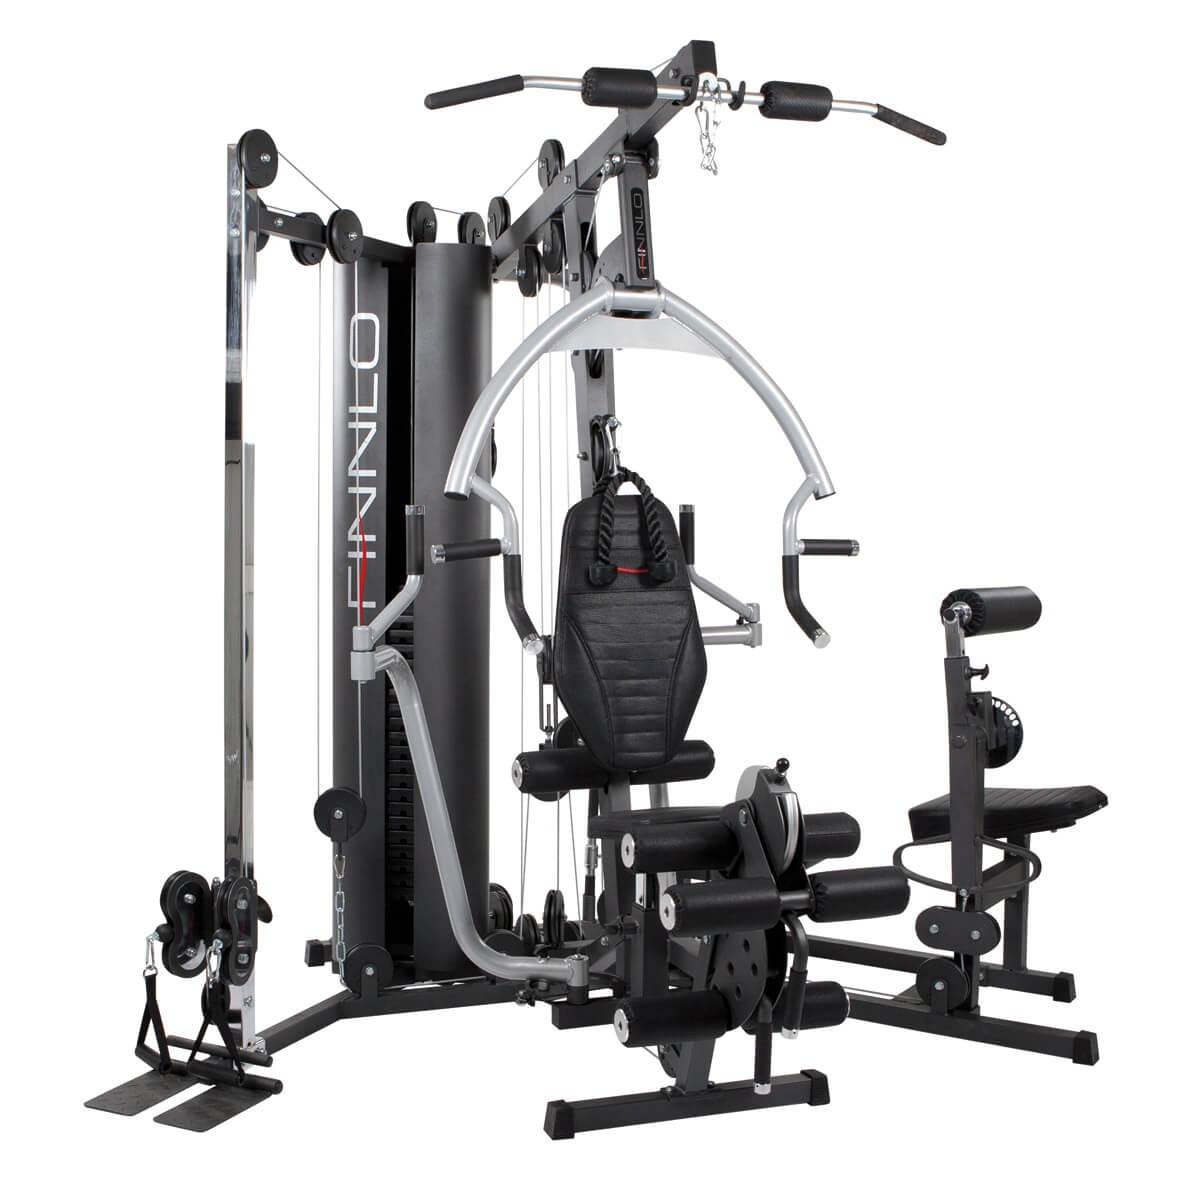 Buy FINNLO by HAMMER multi gym Autark 6600